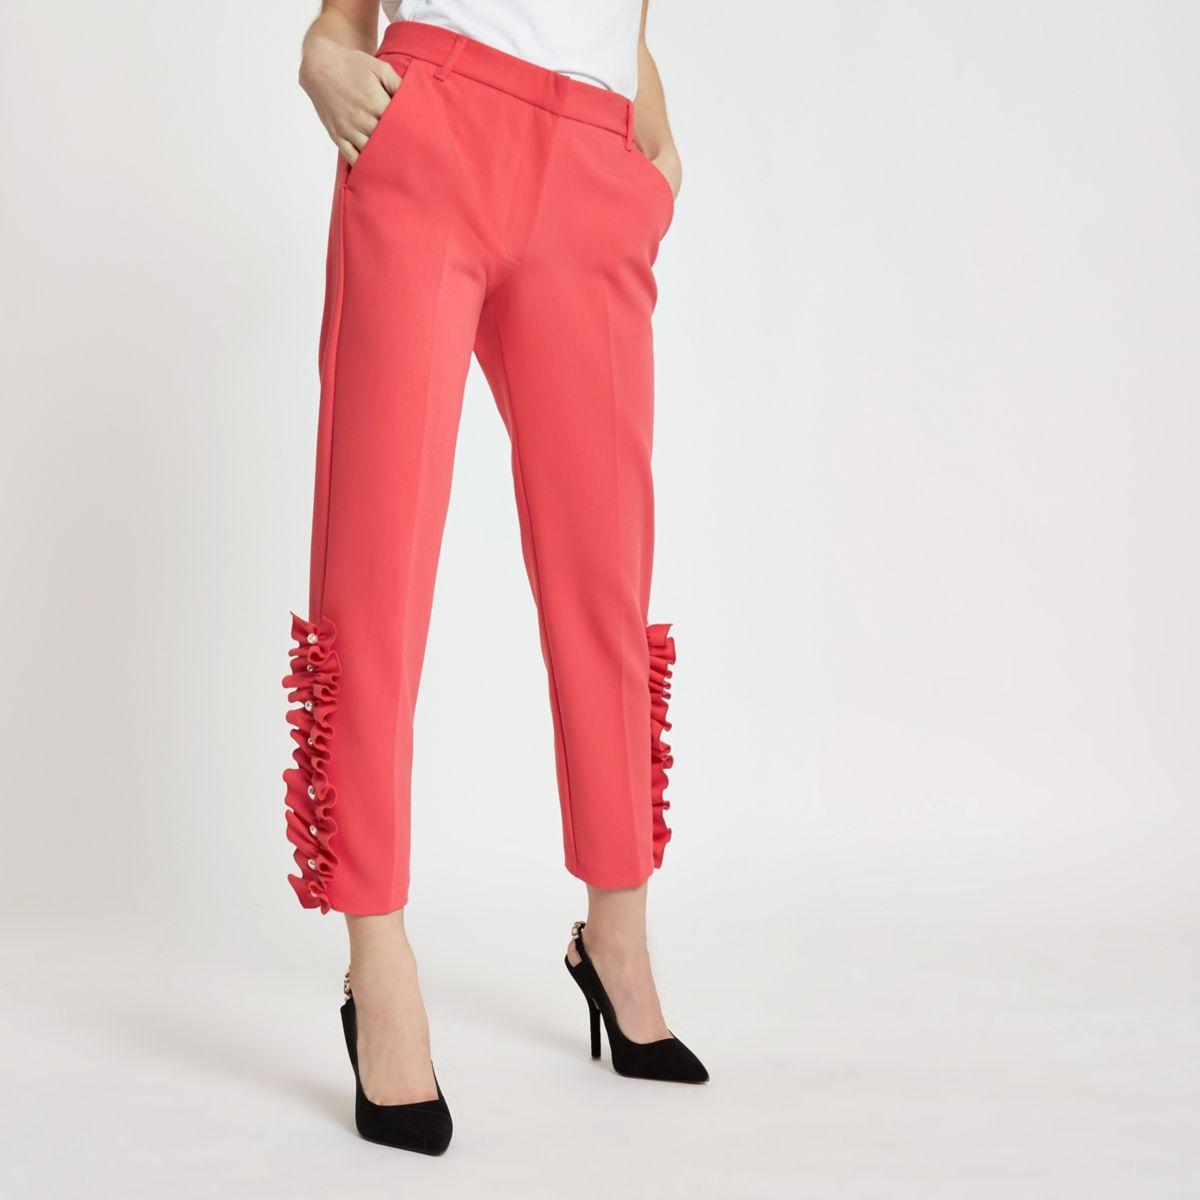 Petite pink pearl hem cigarette trousers